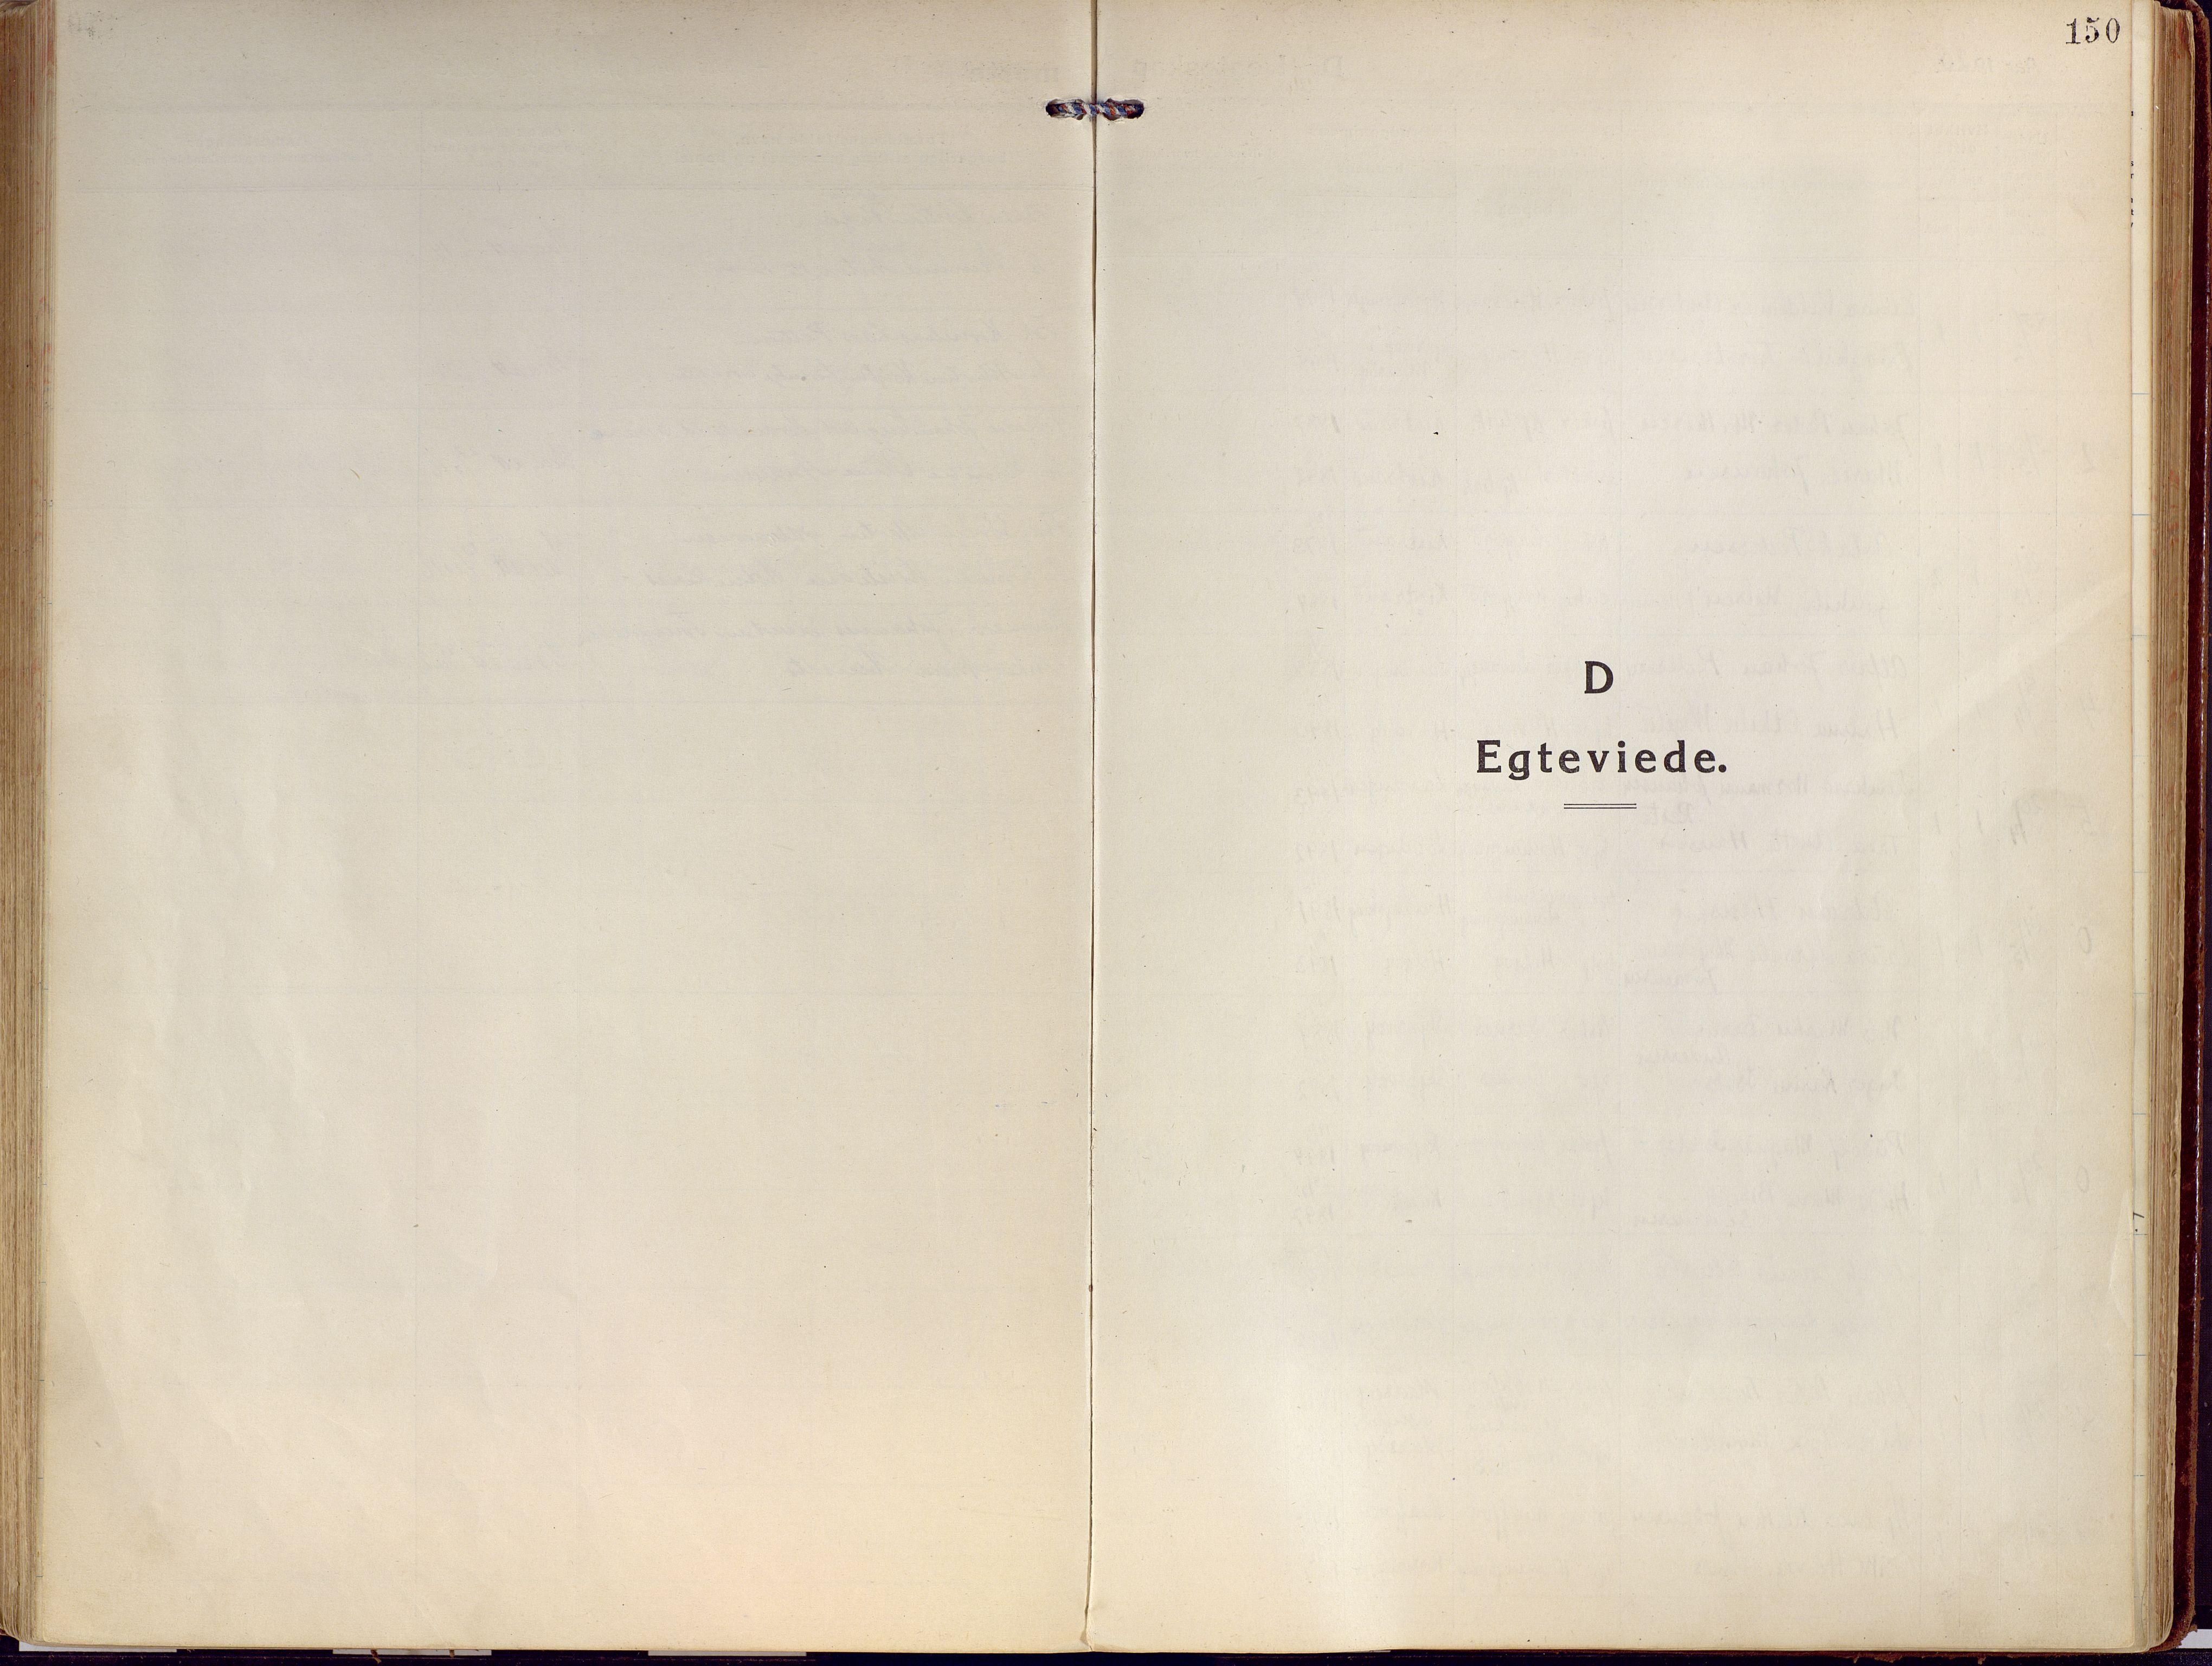 SATØ, Kjelvik/Nordkapp sokneprestkontor, H/Ha/L0002kirke: Ministerialbok nr. 2, 1920-1929, s. 150